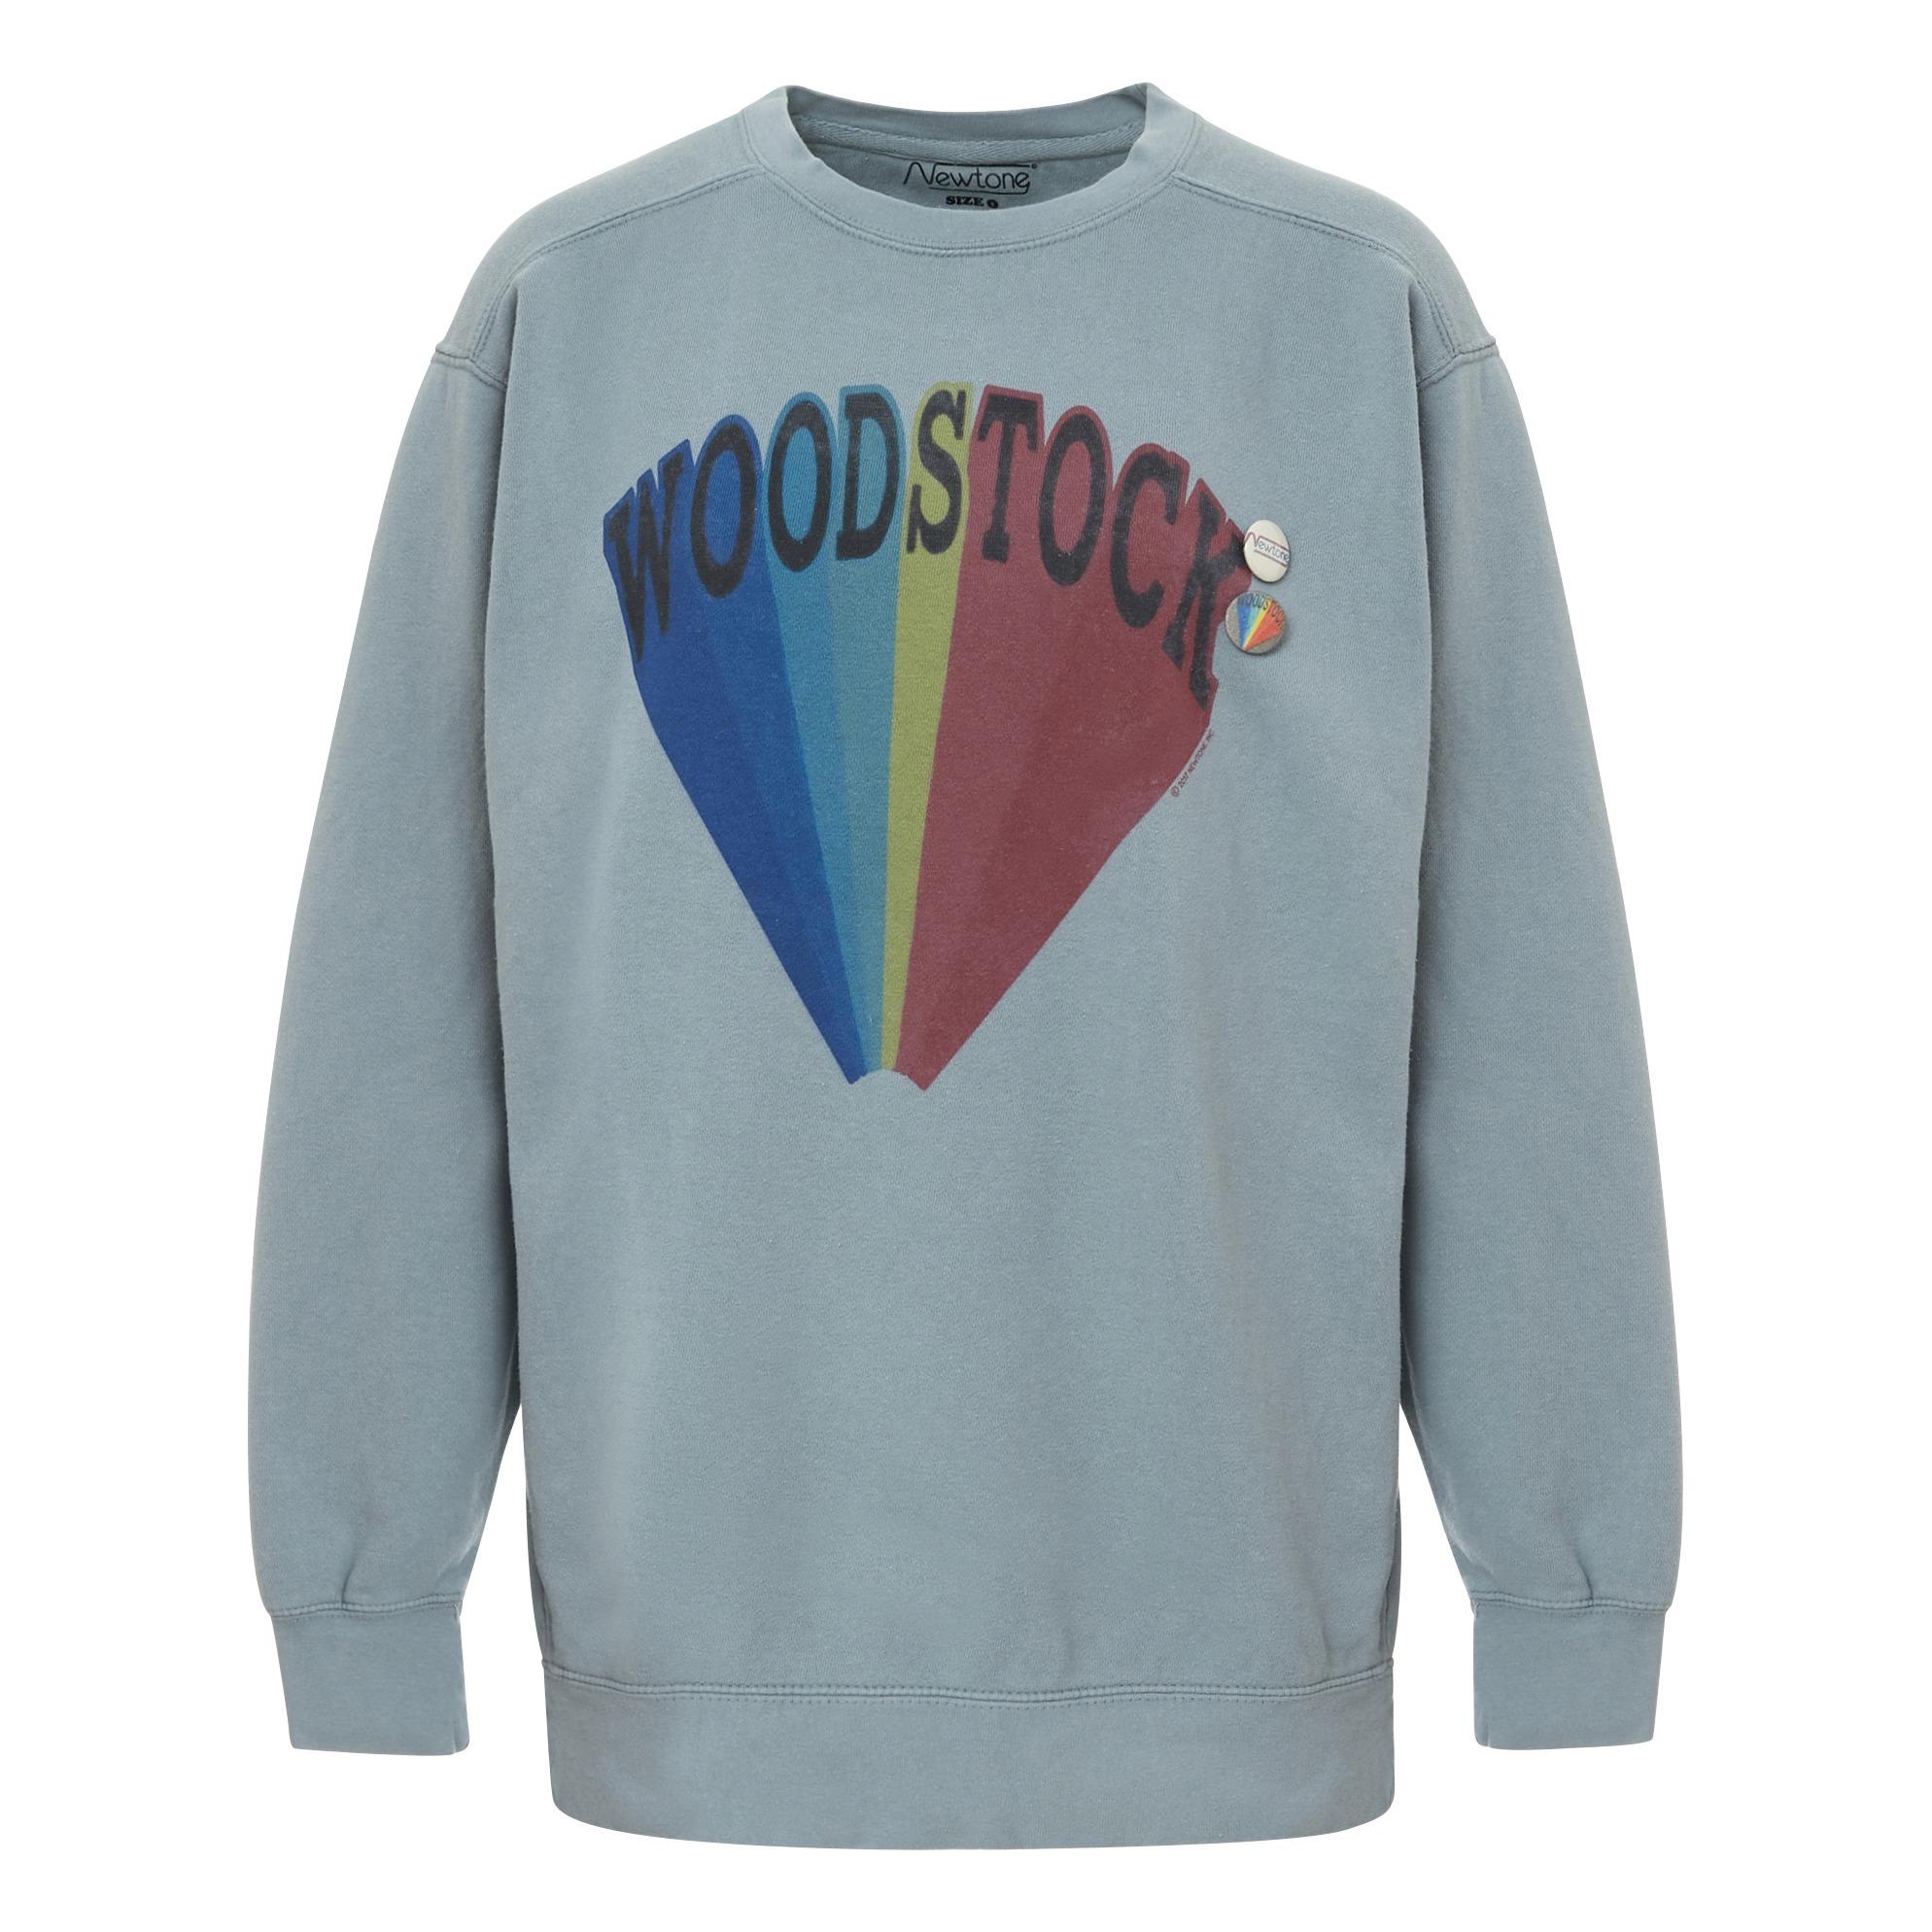 f17e995d7b Woodstock Sweatshirt Light grey Newtone Fashion Adult